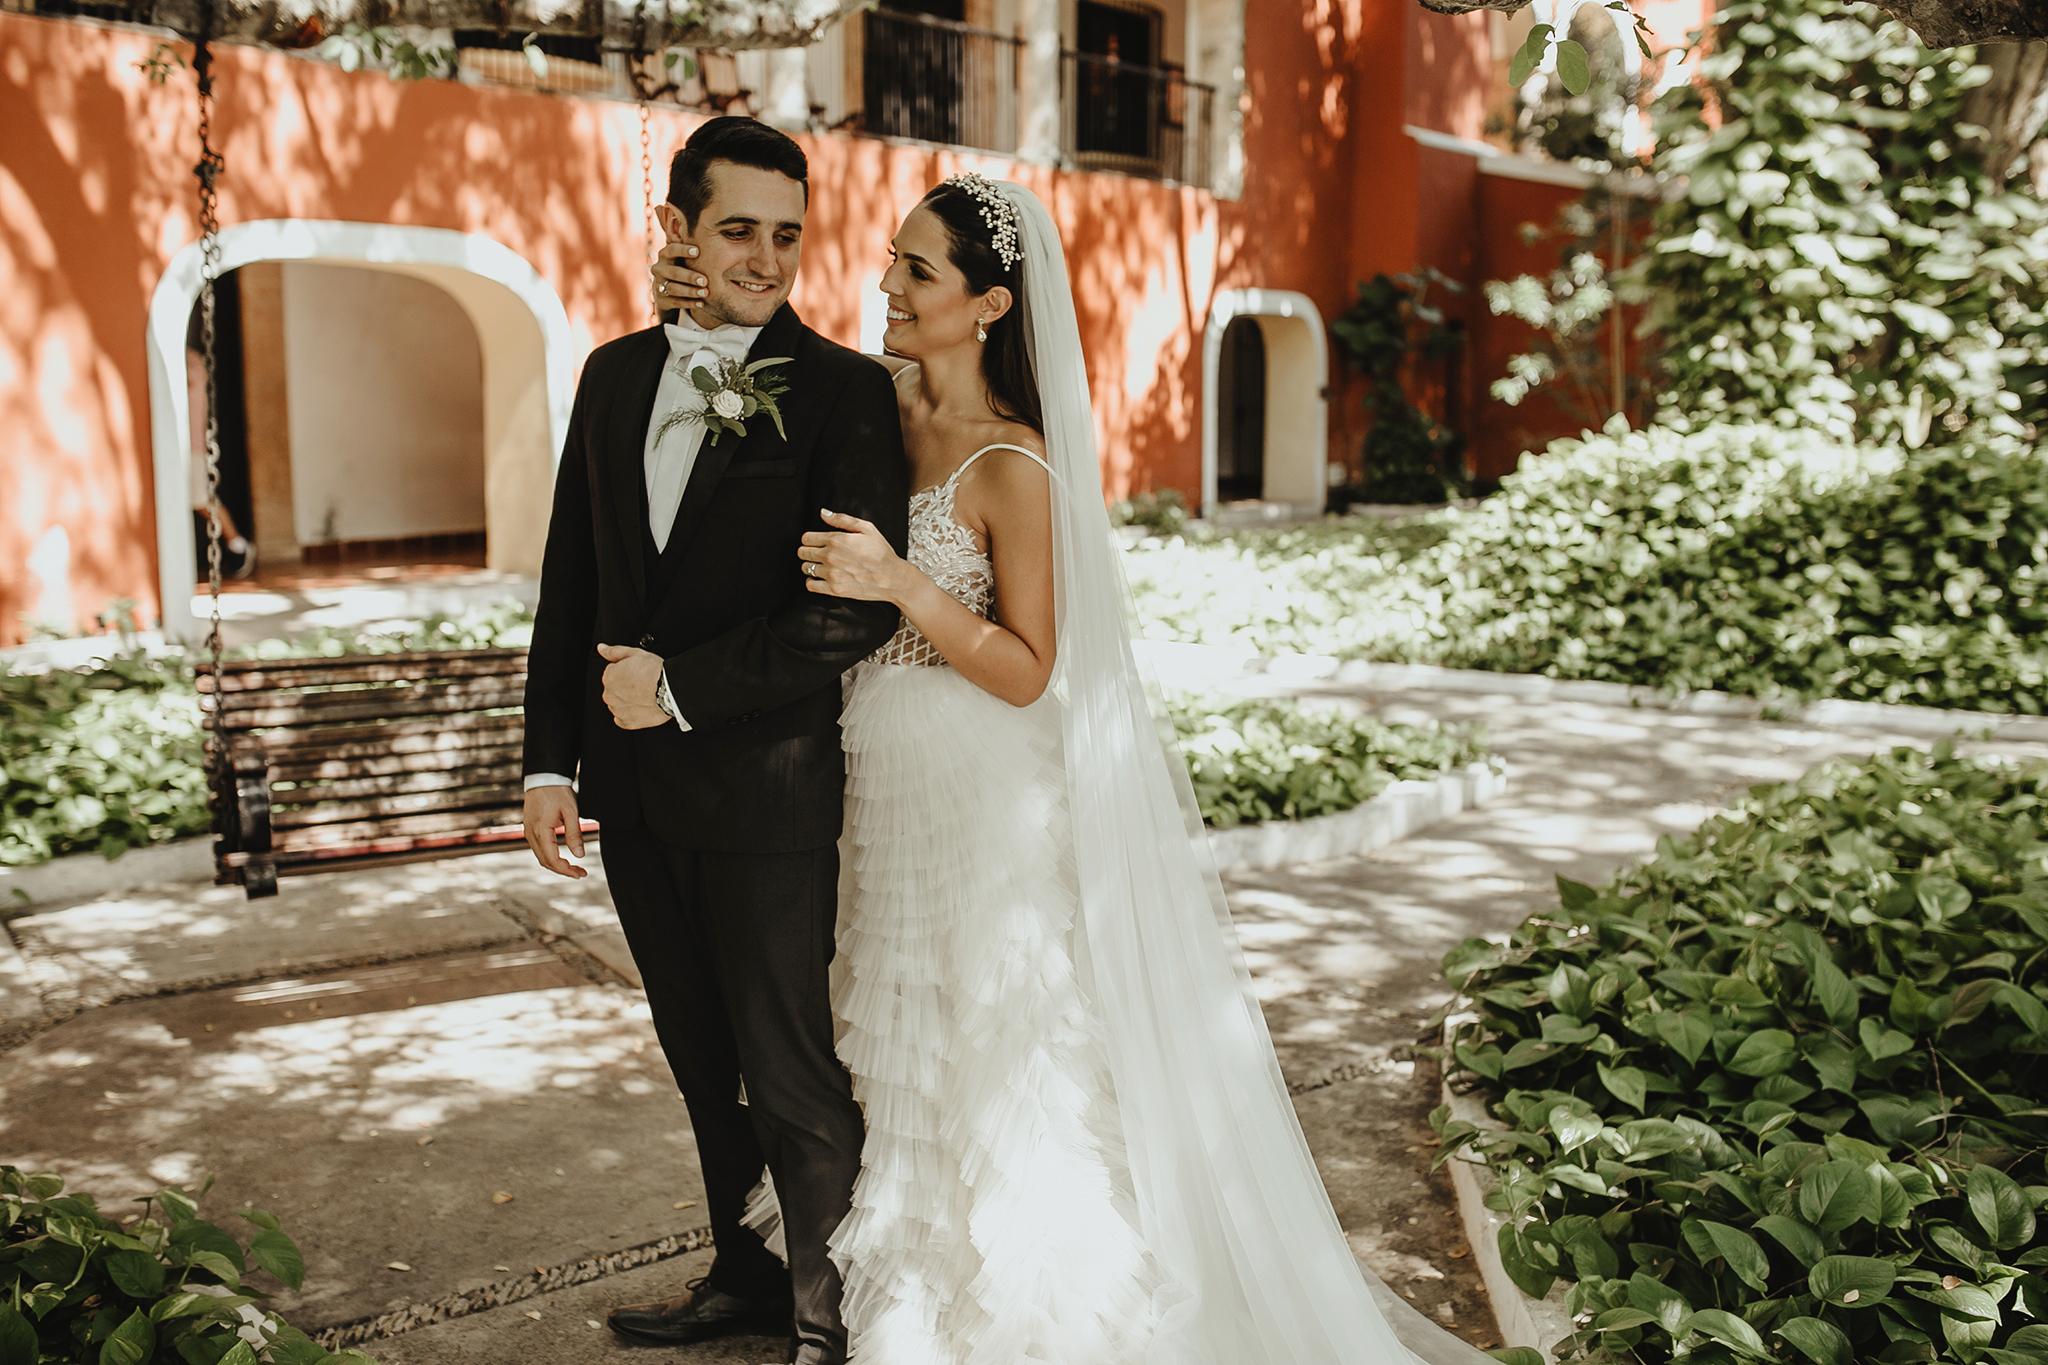 0361R&F__WeddingDestination_Weddingmerida_BodaMexico_FotografoDeBodas_FabrizioSimoneenFotografo.jpg